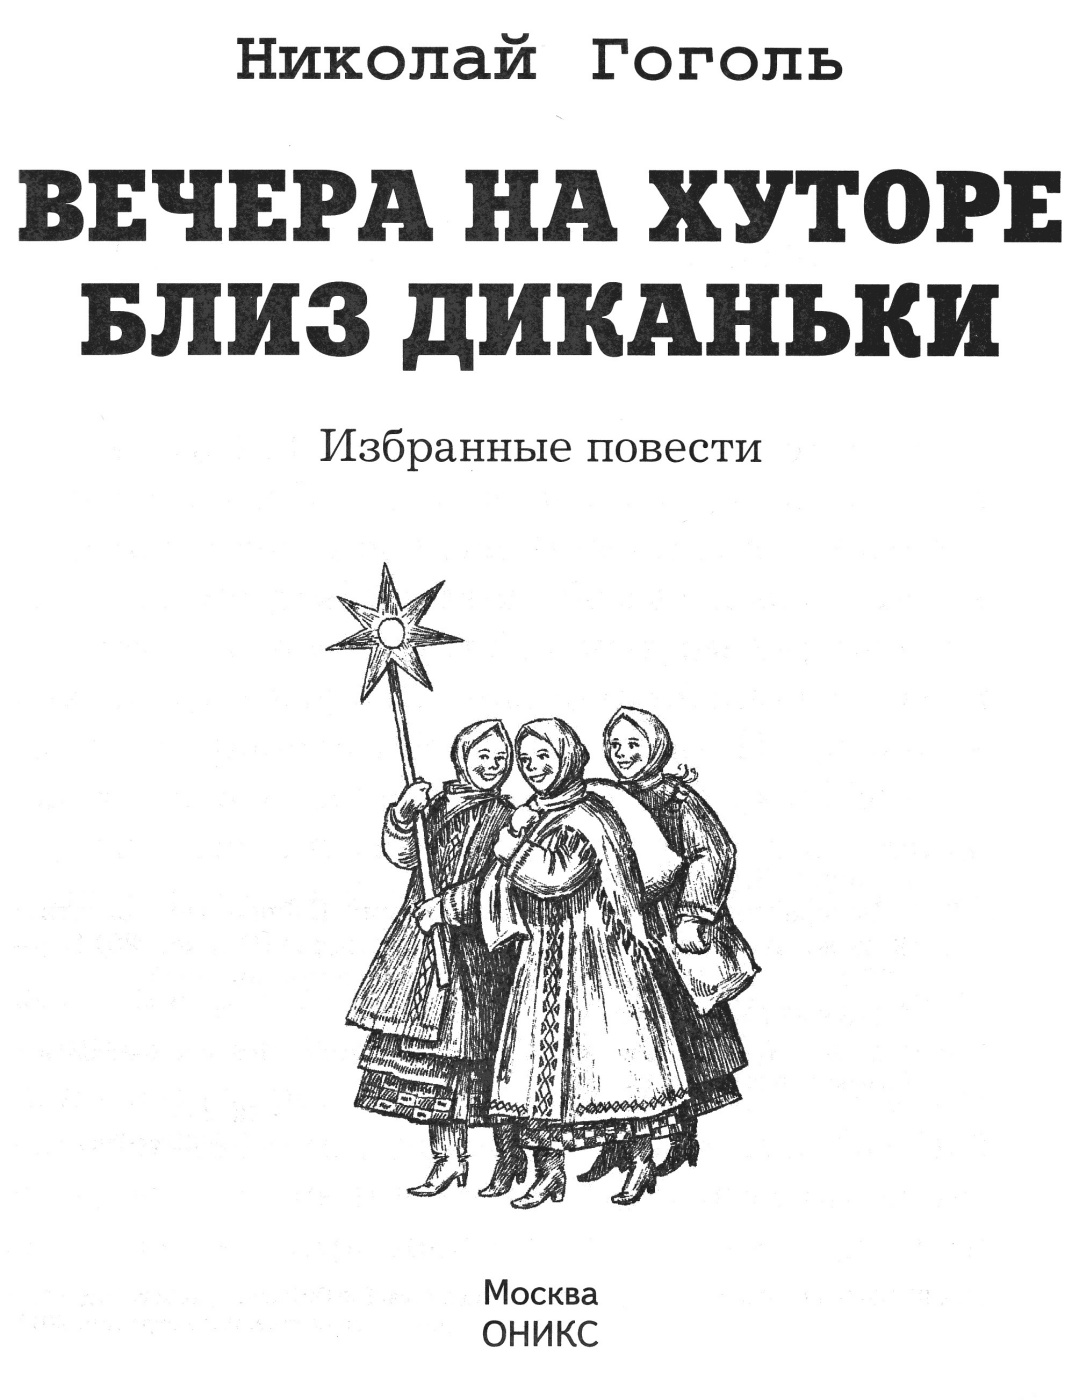 Alexander Vasilievich Kuzmin. Evenings on a farm near Dikanka. Title page. N.V. Gogol.